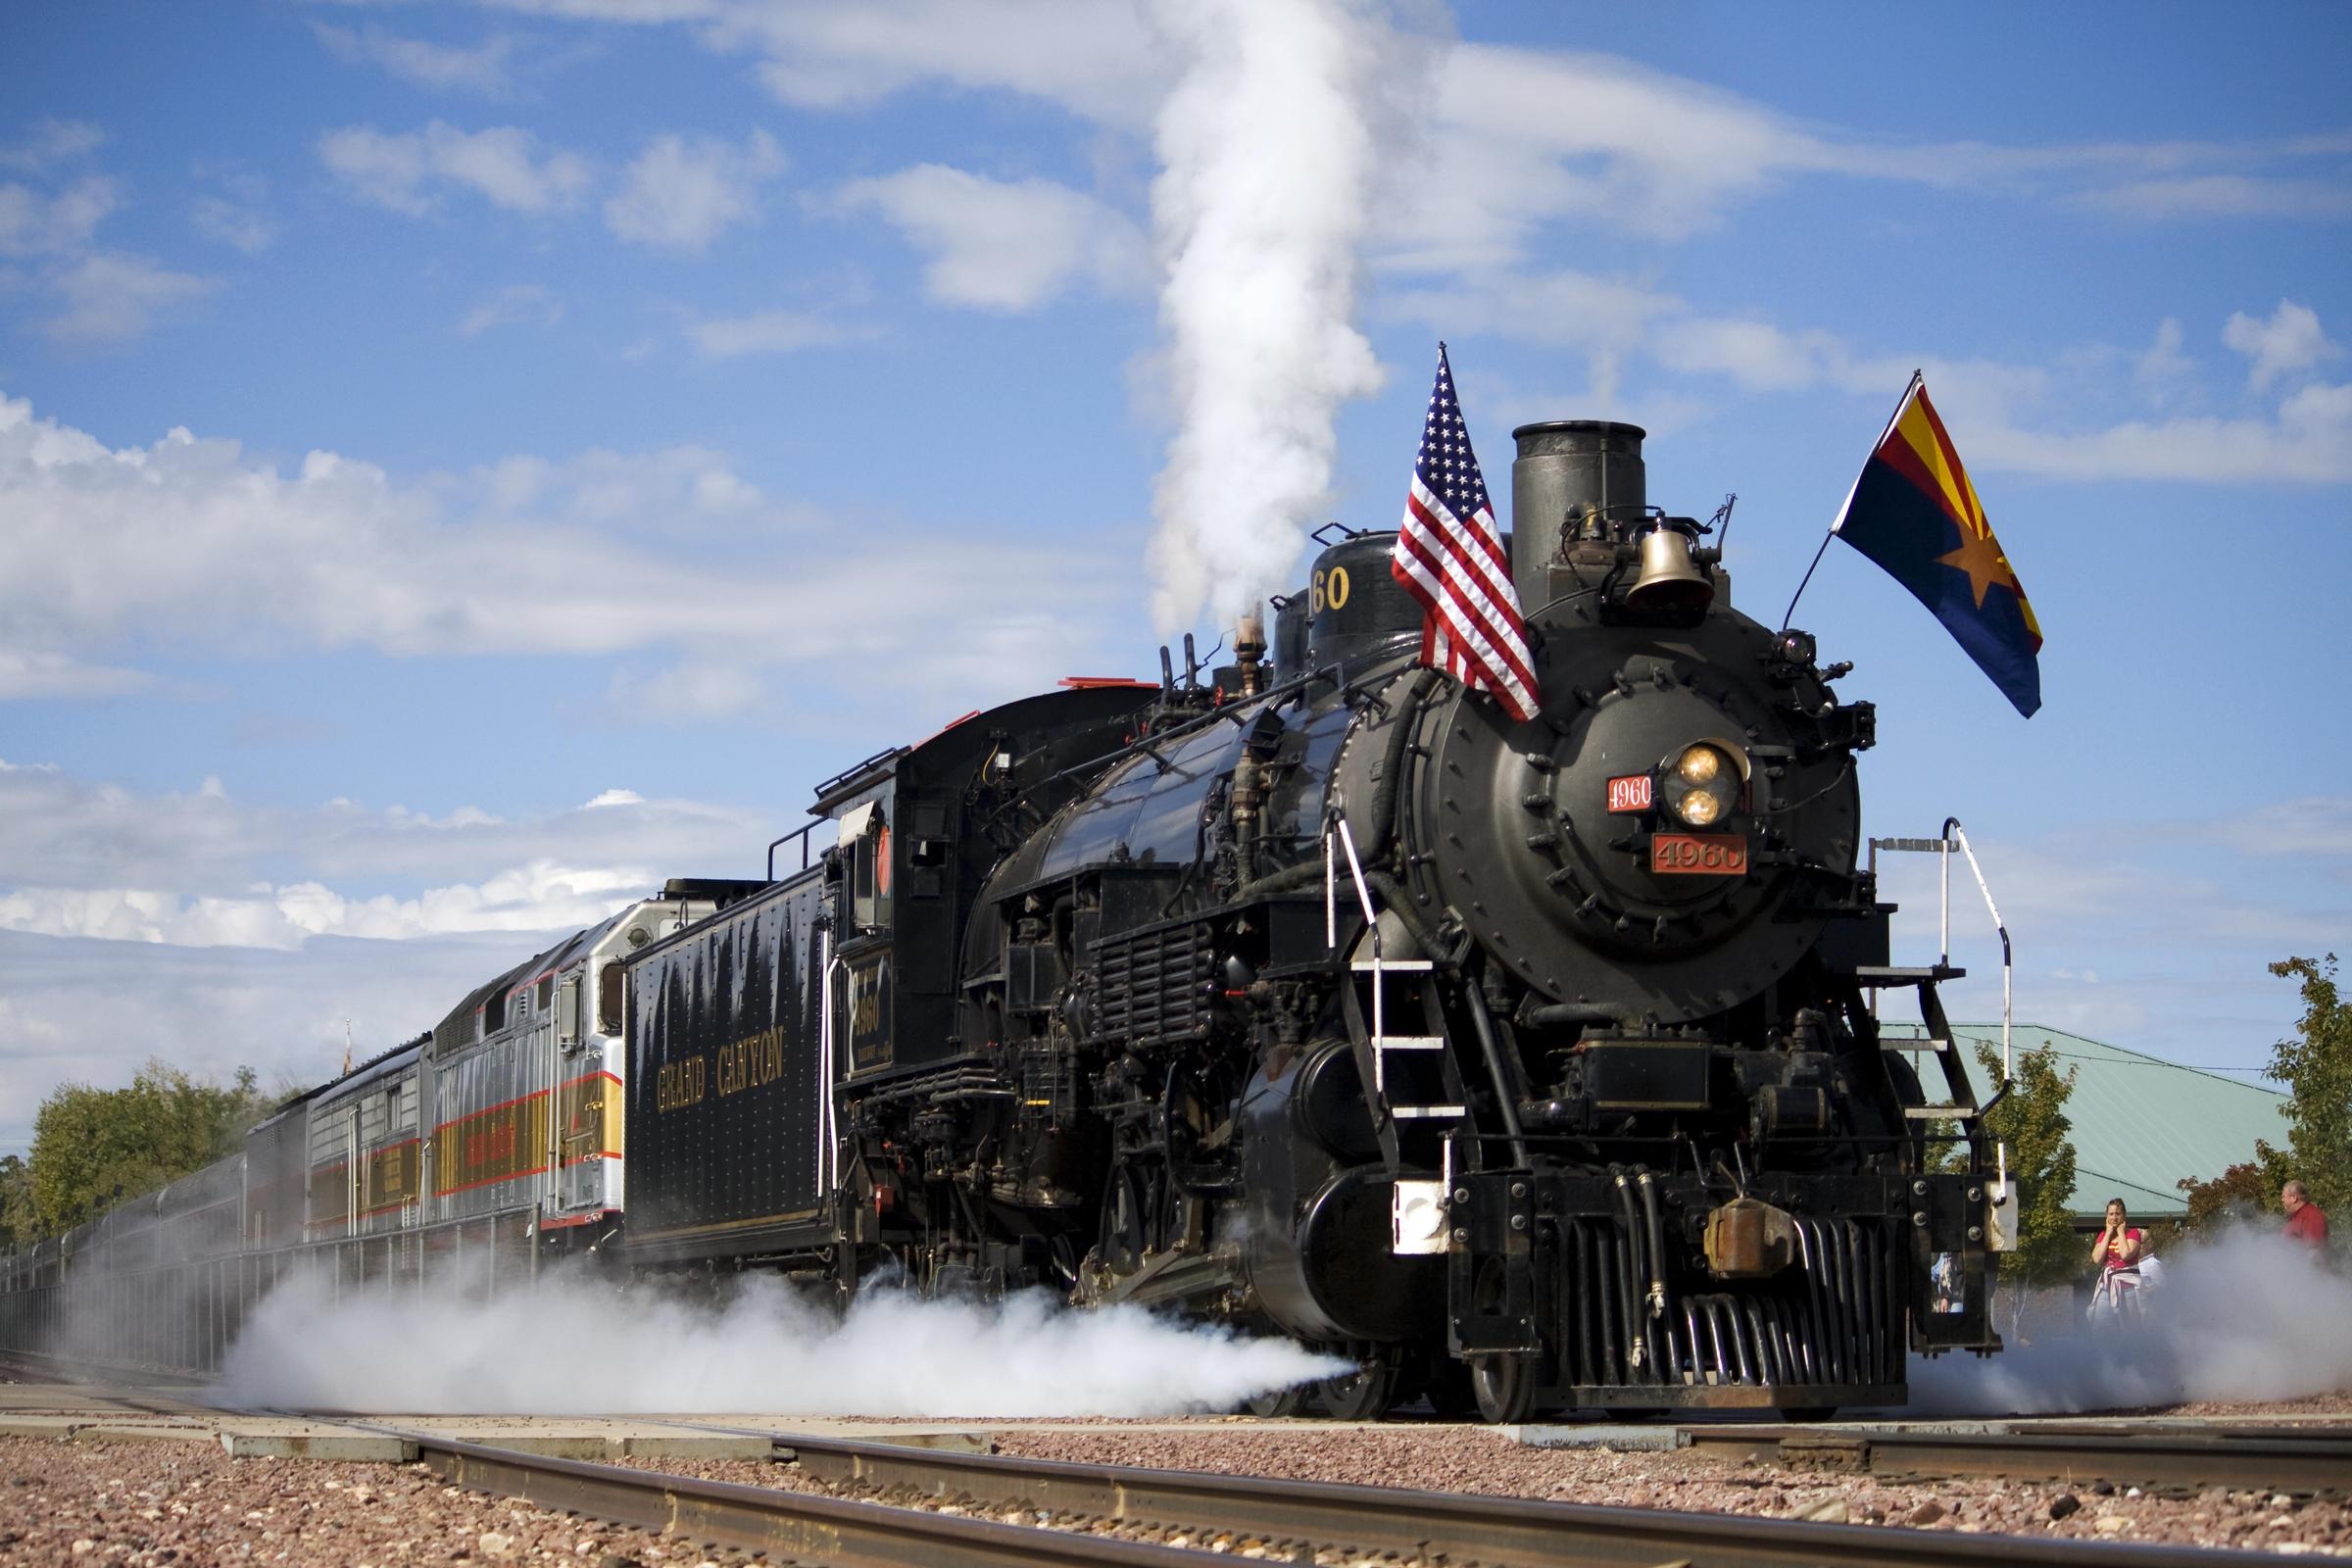 Grand Canyon Railway >> Ridership On Grand Canyon Railway Up In 2017 Knau Arizona Public Radio